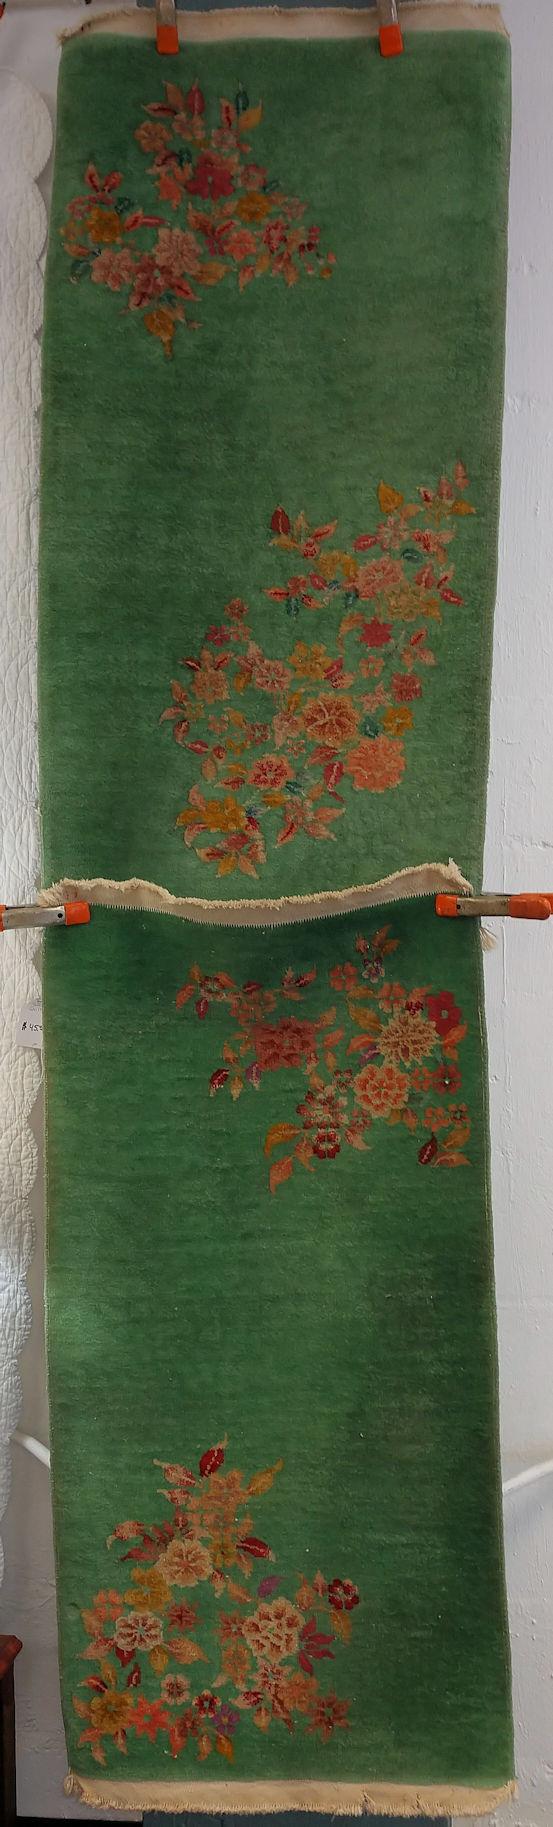 KK0066-Rugs-Chinese-Garden-Pattern